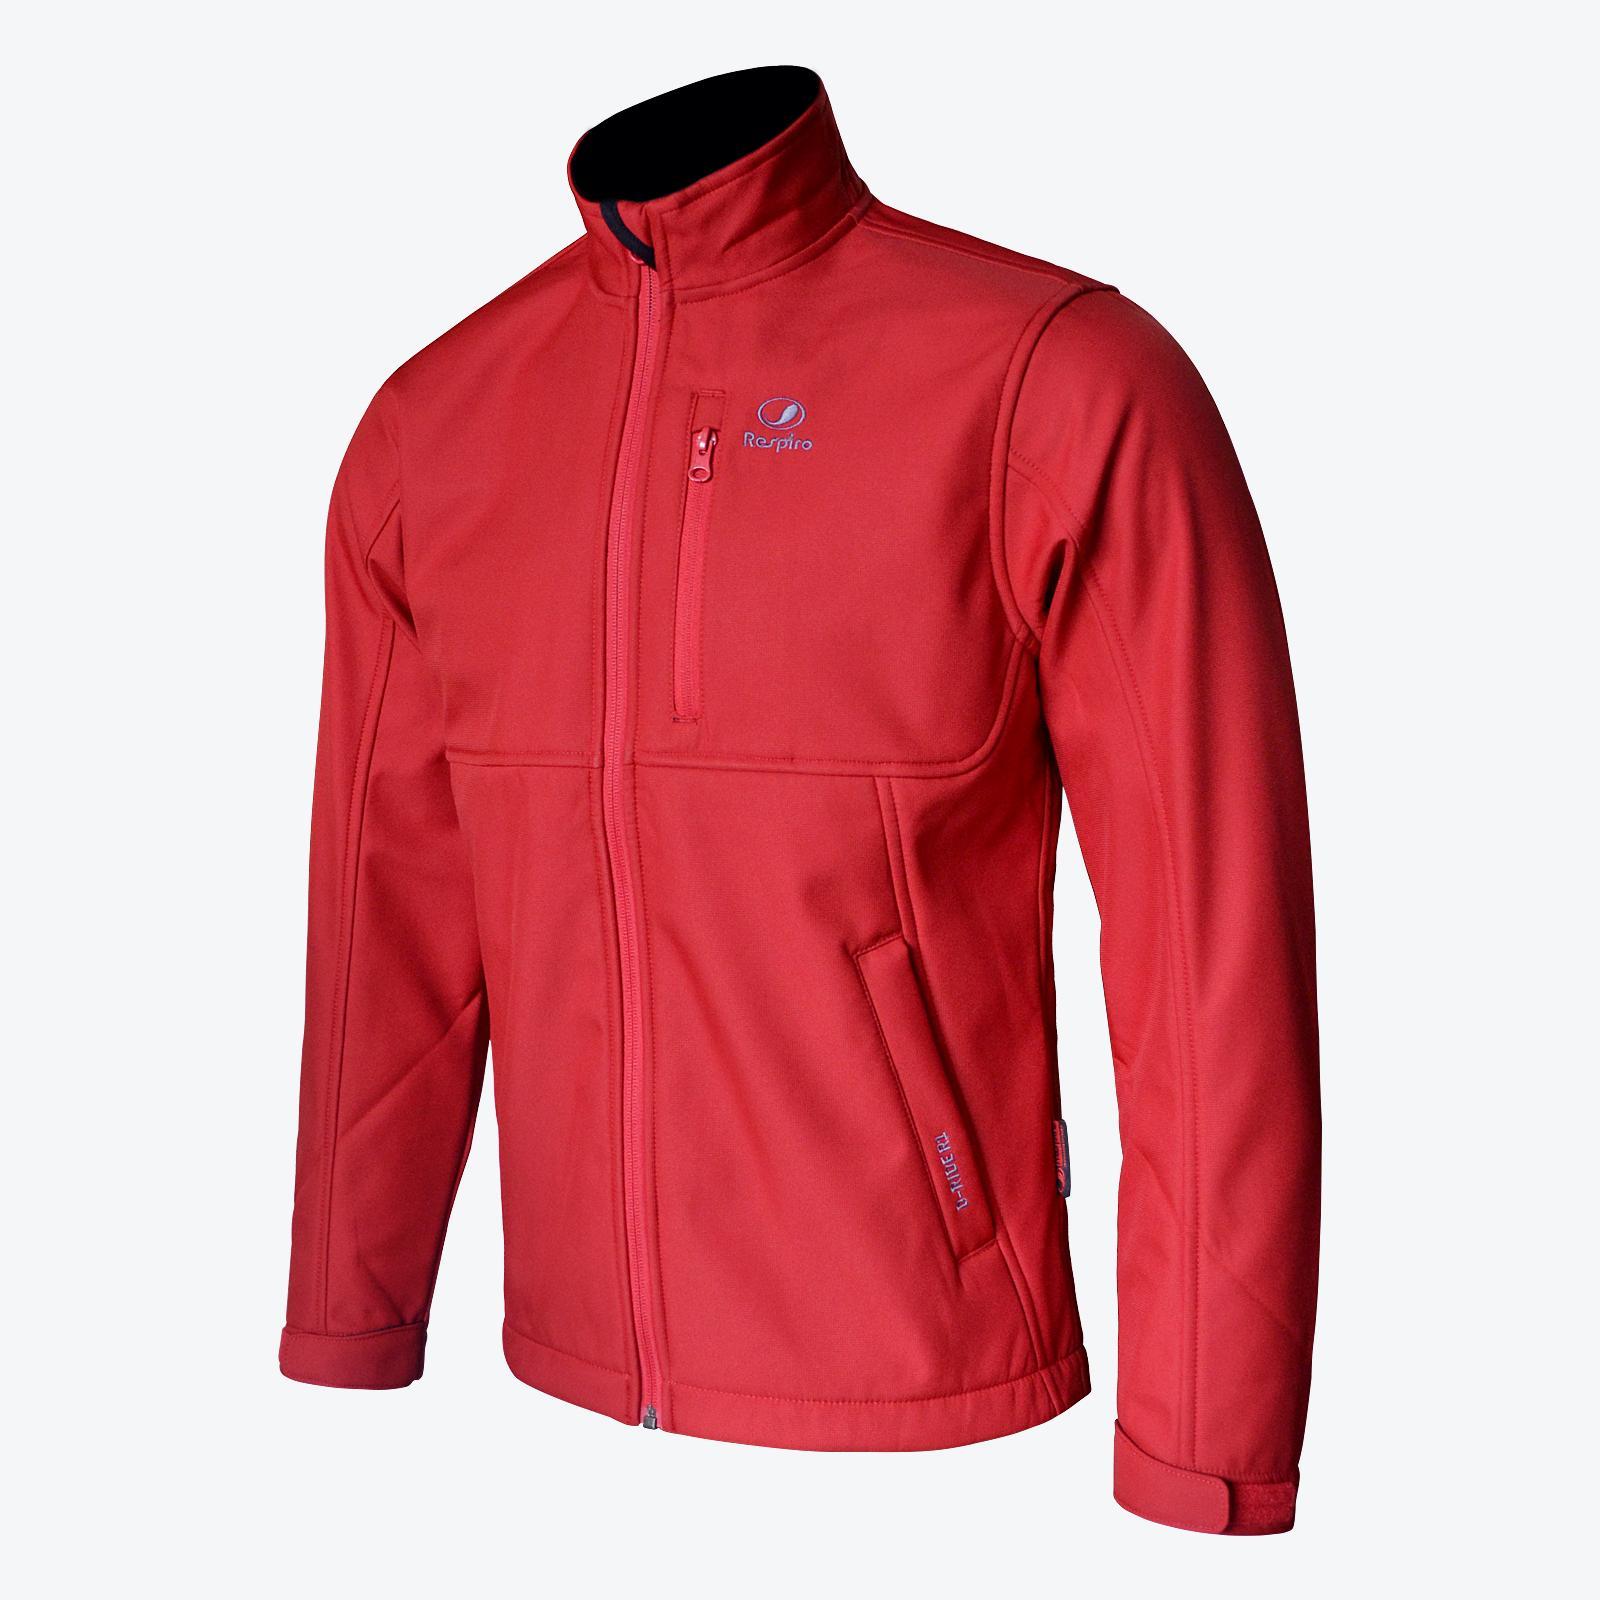 Respiro - Jaket Motor D-Ride R1 - Merah